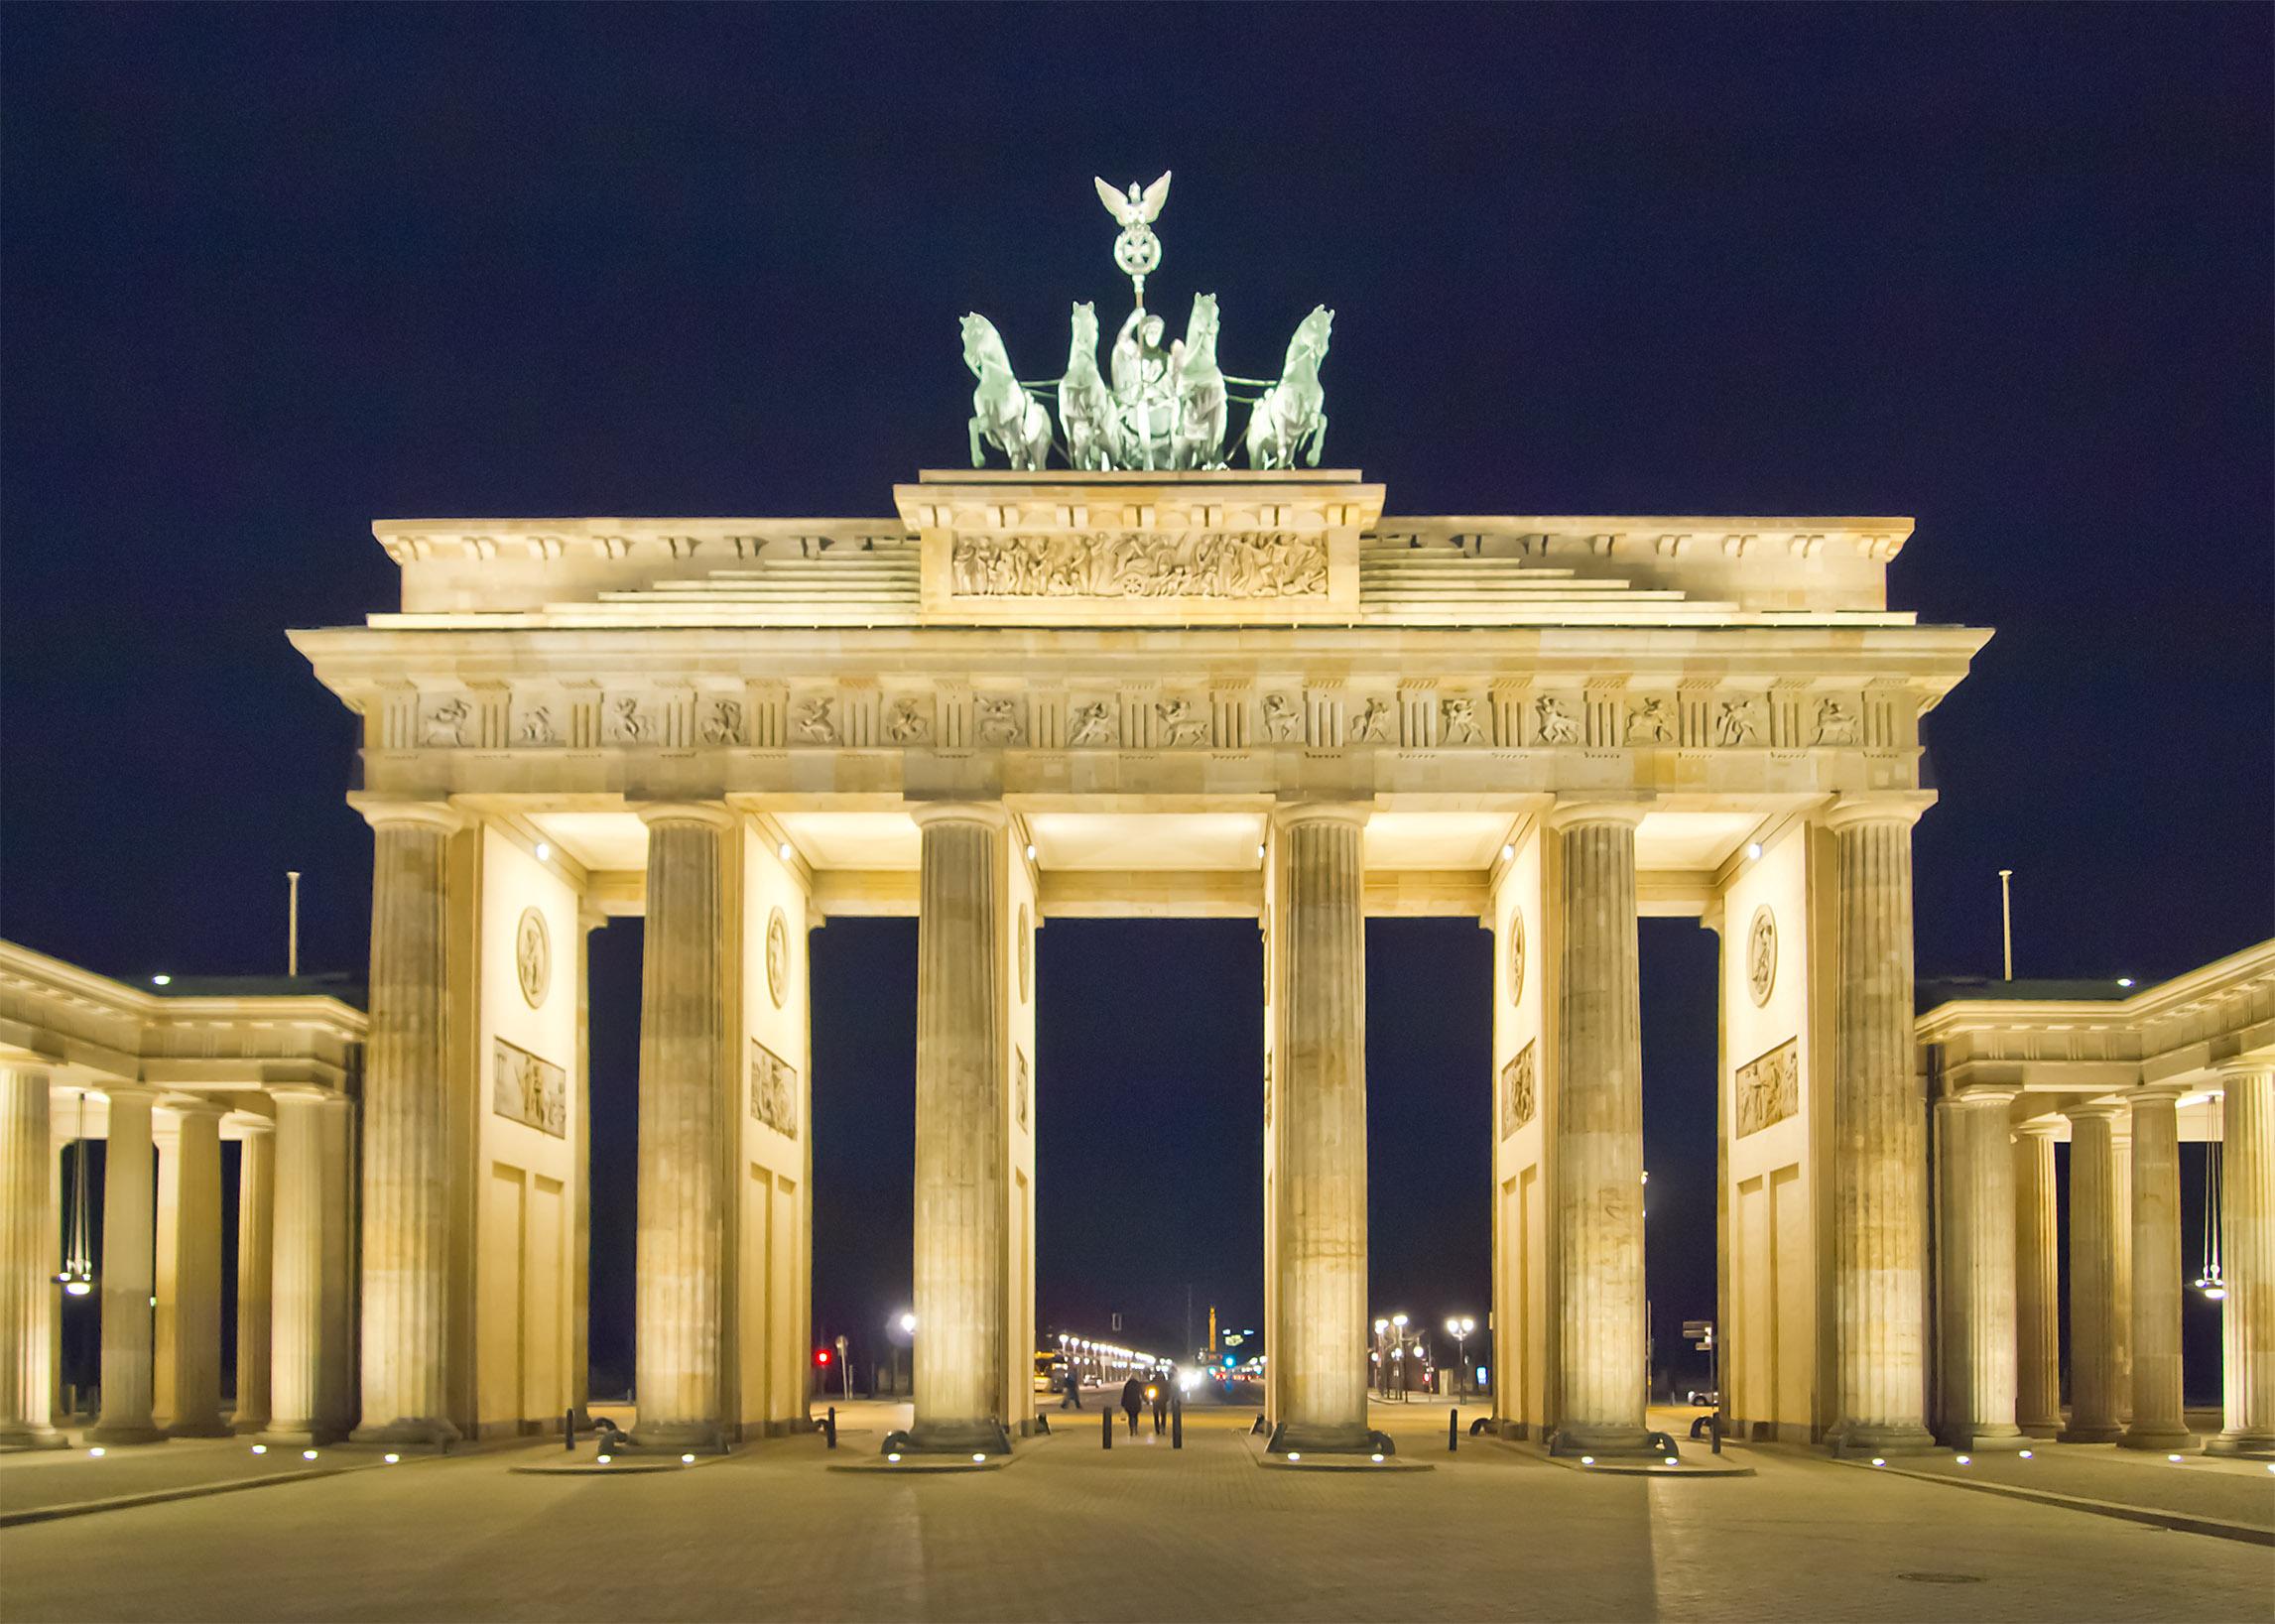 Berlin_Brandenburger_Tor_Nacht.jpg